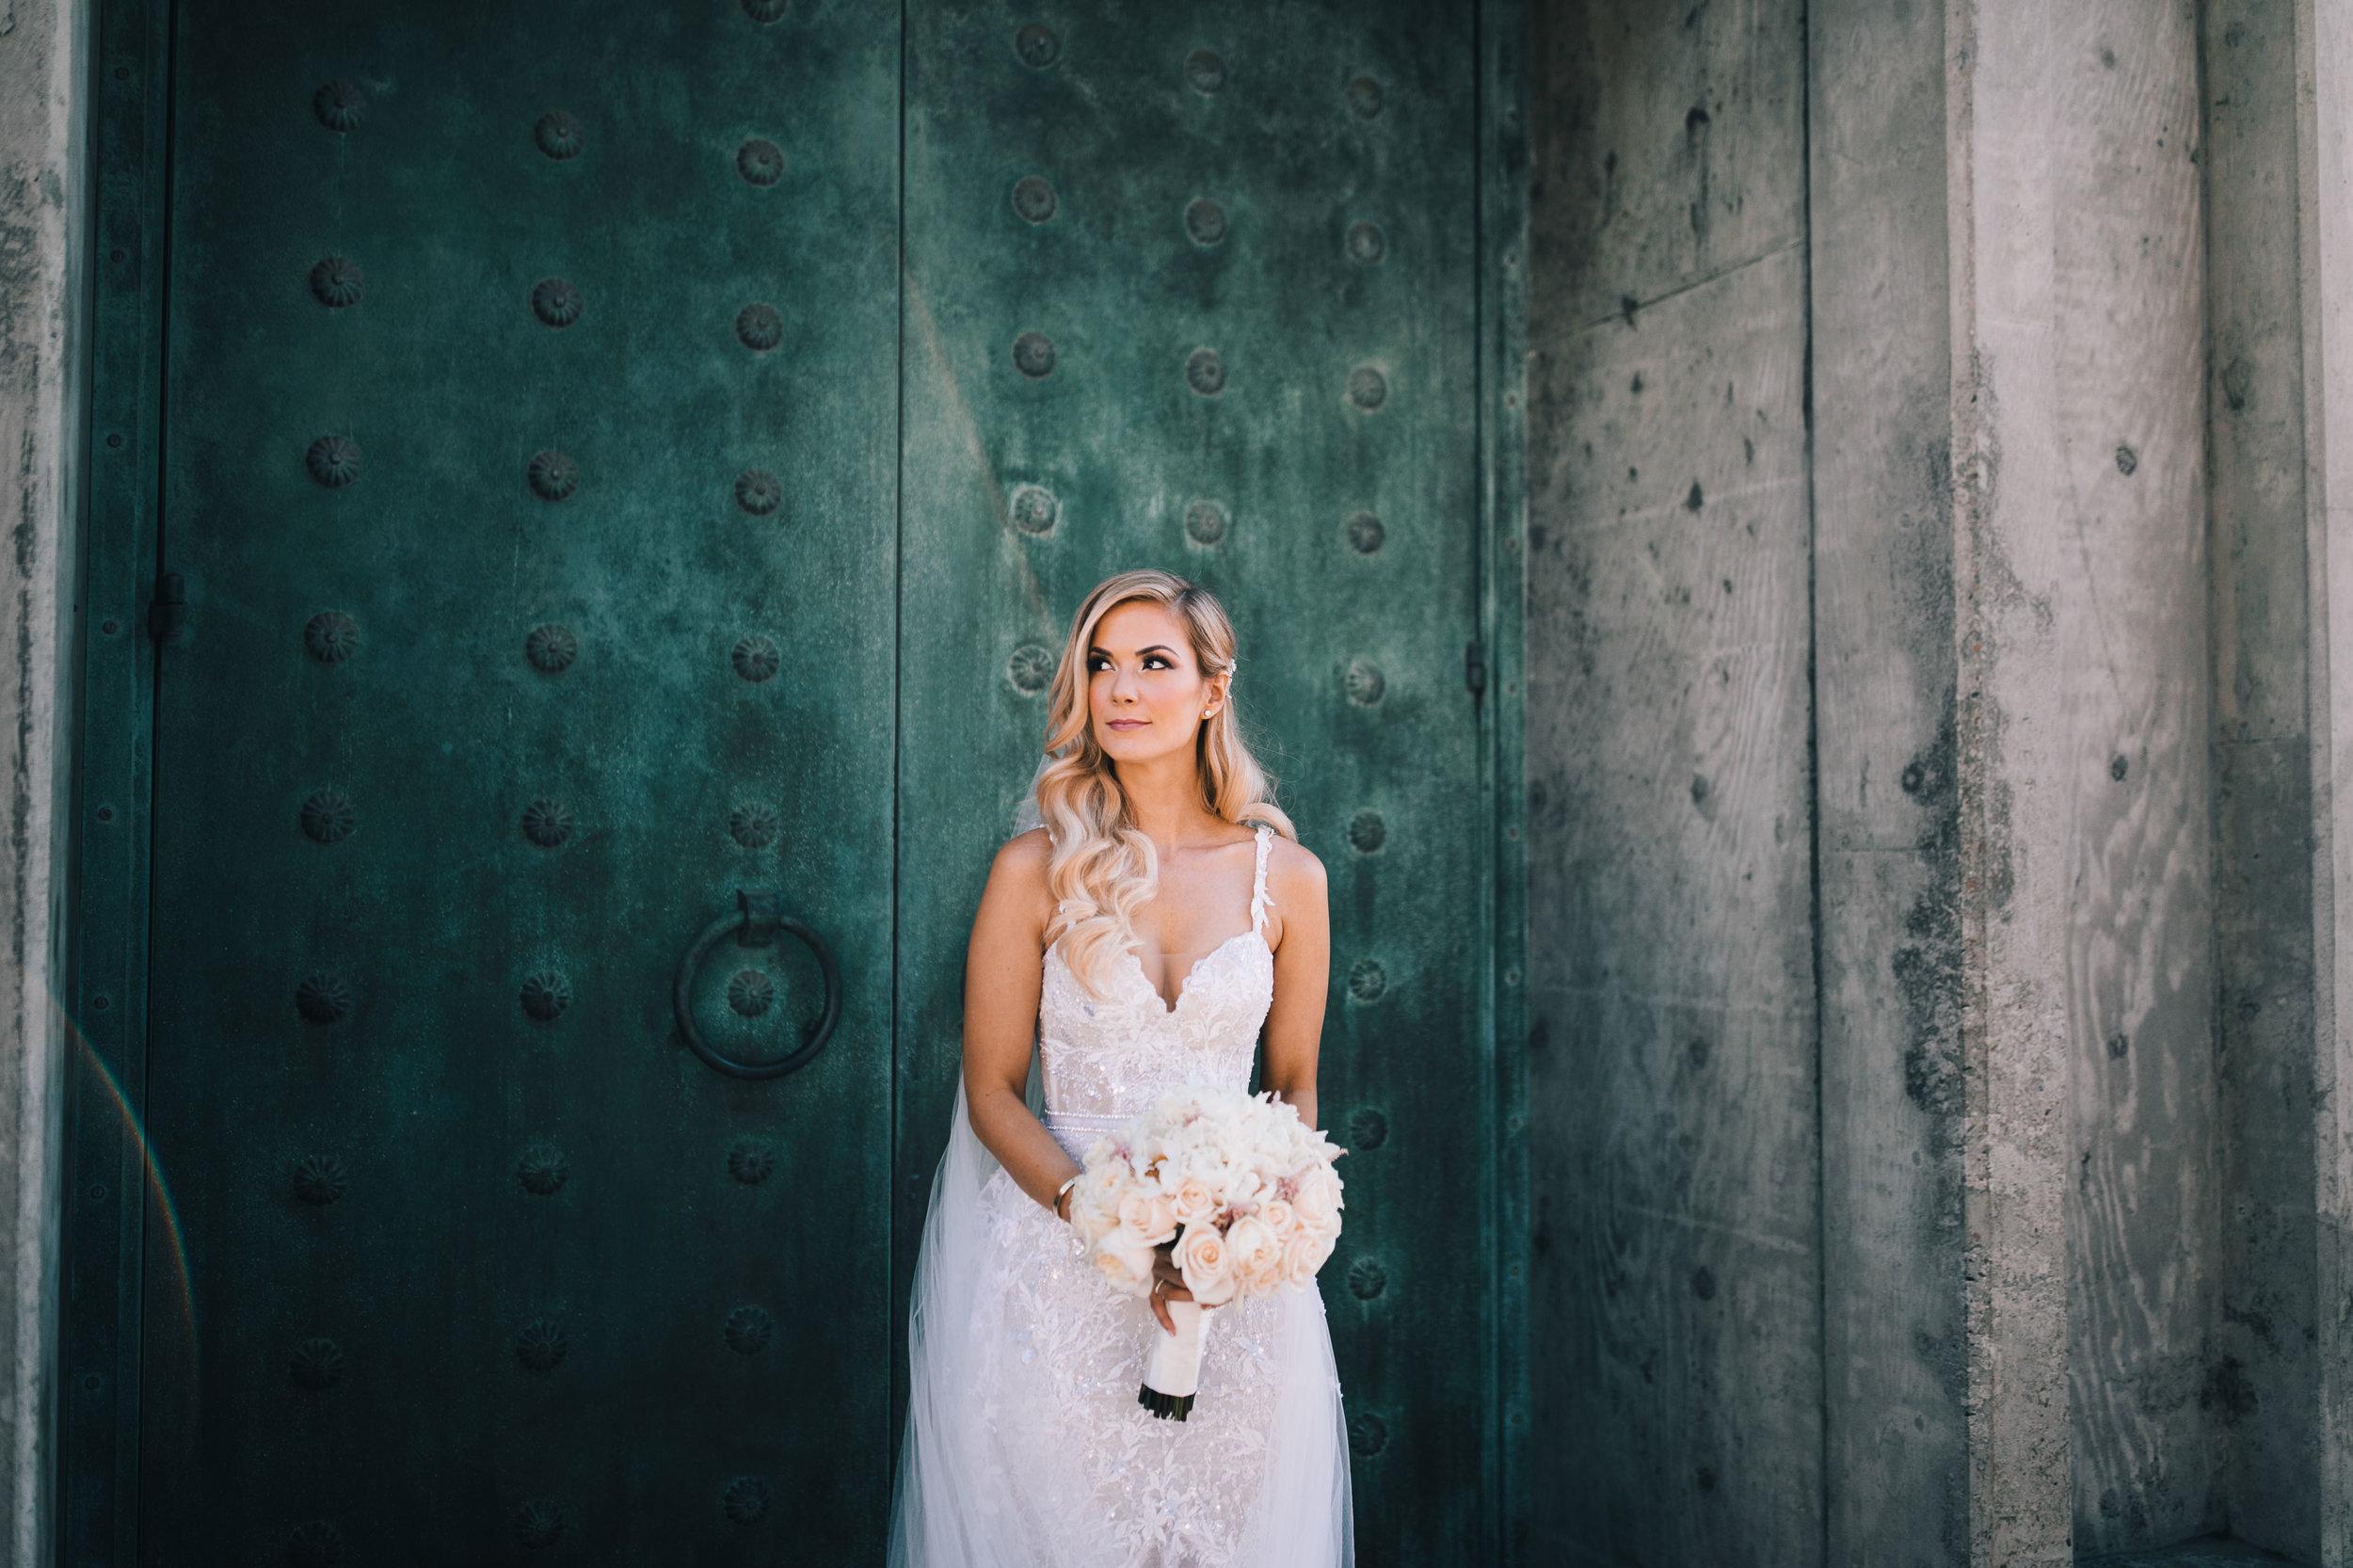 2018.09.08 Litsa and Sofo Greek Wedding Sneak Peak-5.jpg